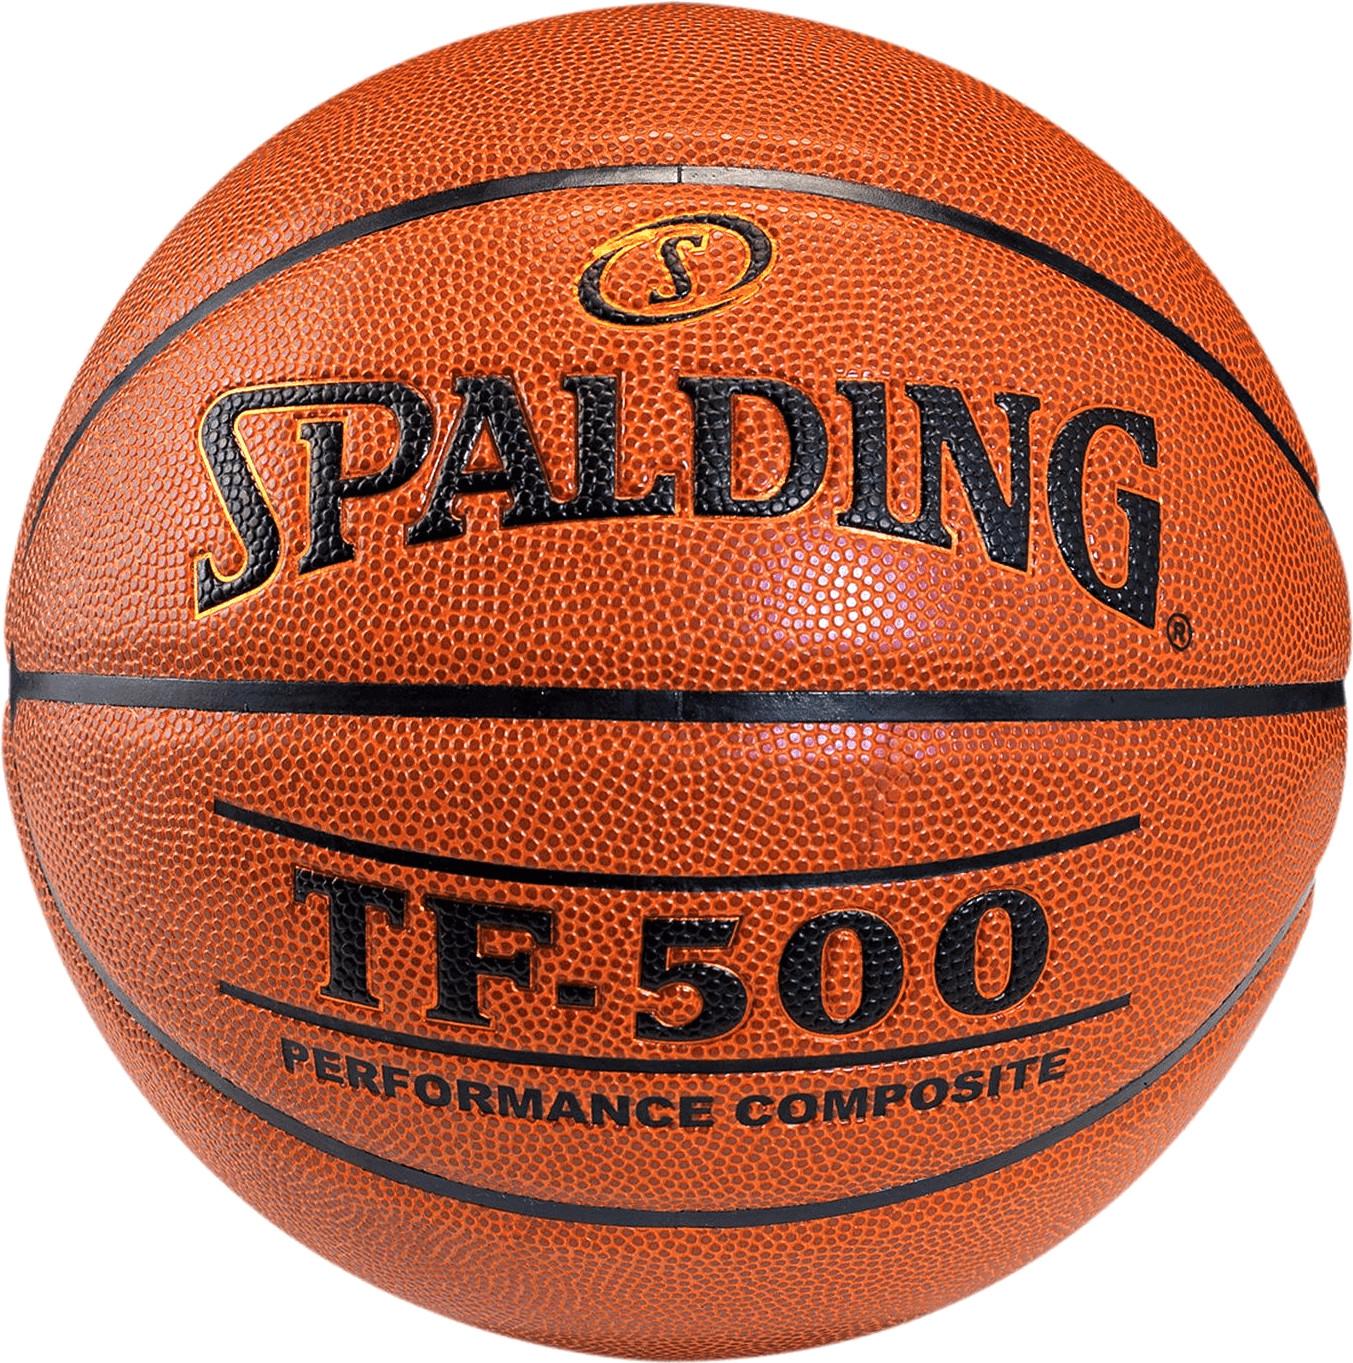 Spalding Basketball TF500 Indoor/Outdoor Damen Ball orange Gr. 6 3001503011216